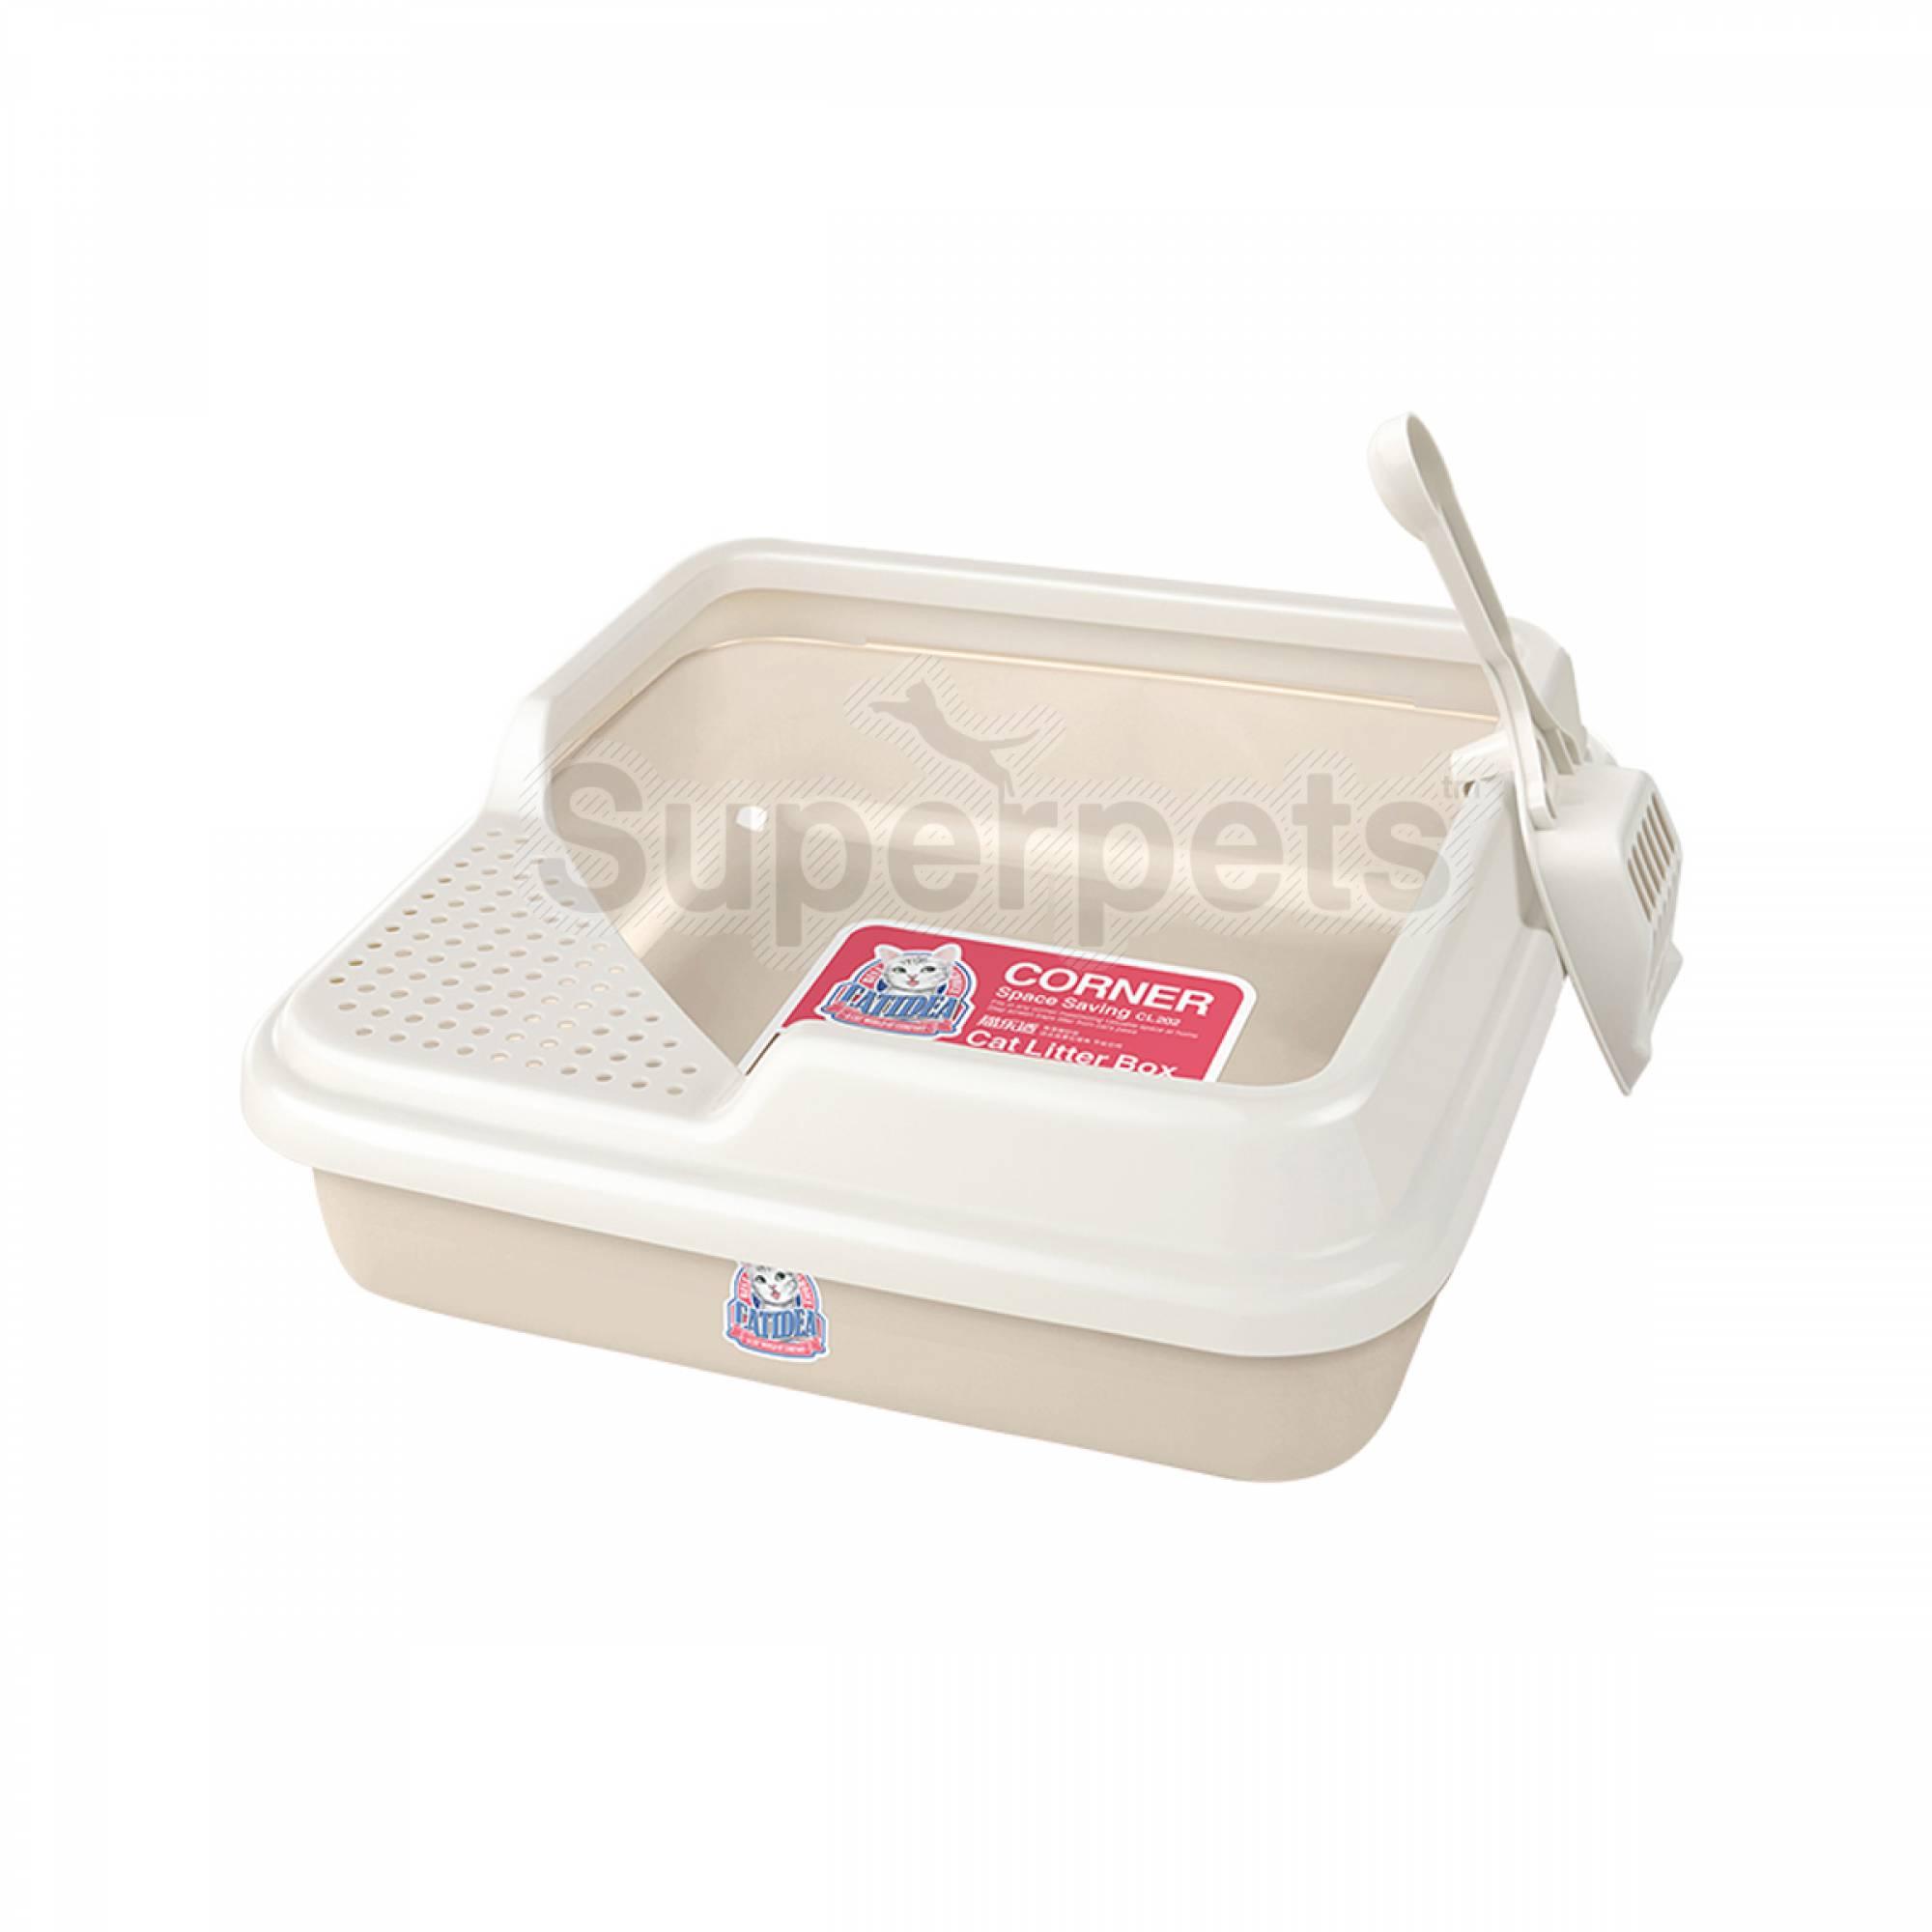 CATIDEA - CL202 Corner Cat Litter Box - Cream